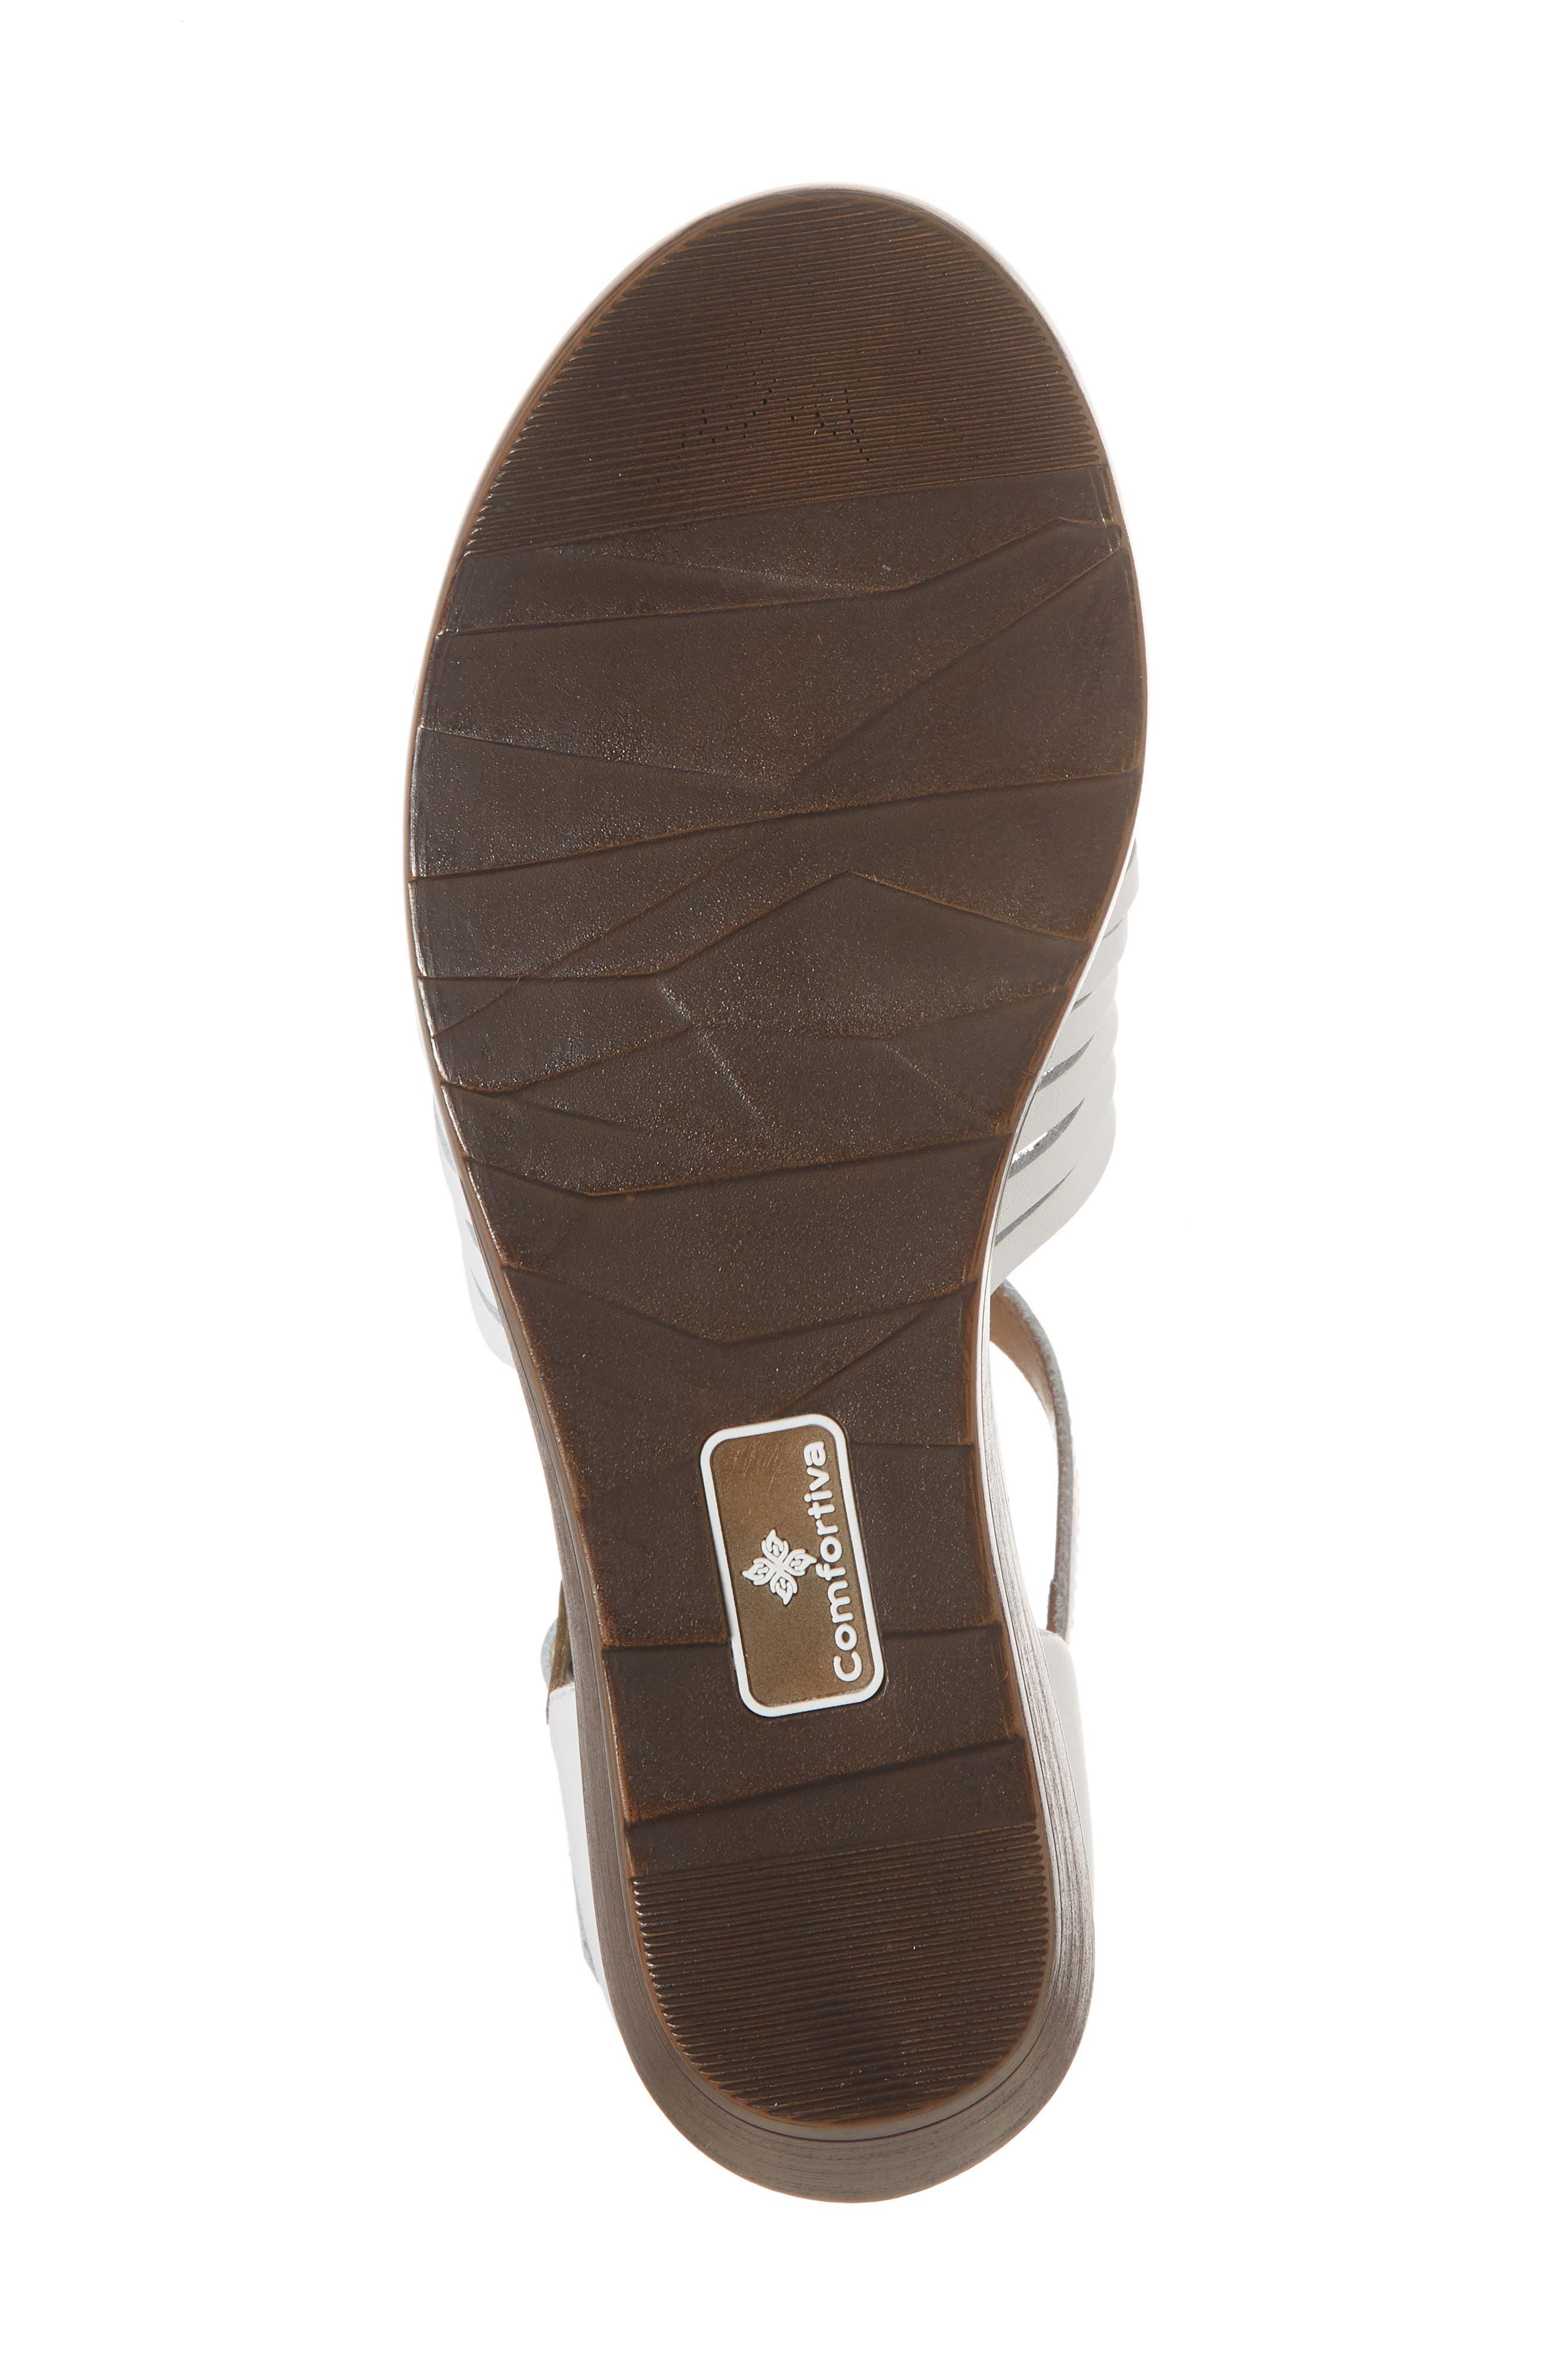 Fayann Sandal,                             Alternate thumbnail 6, color,                             White Leather